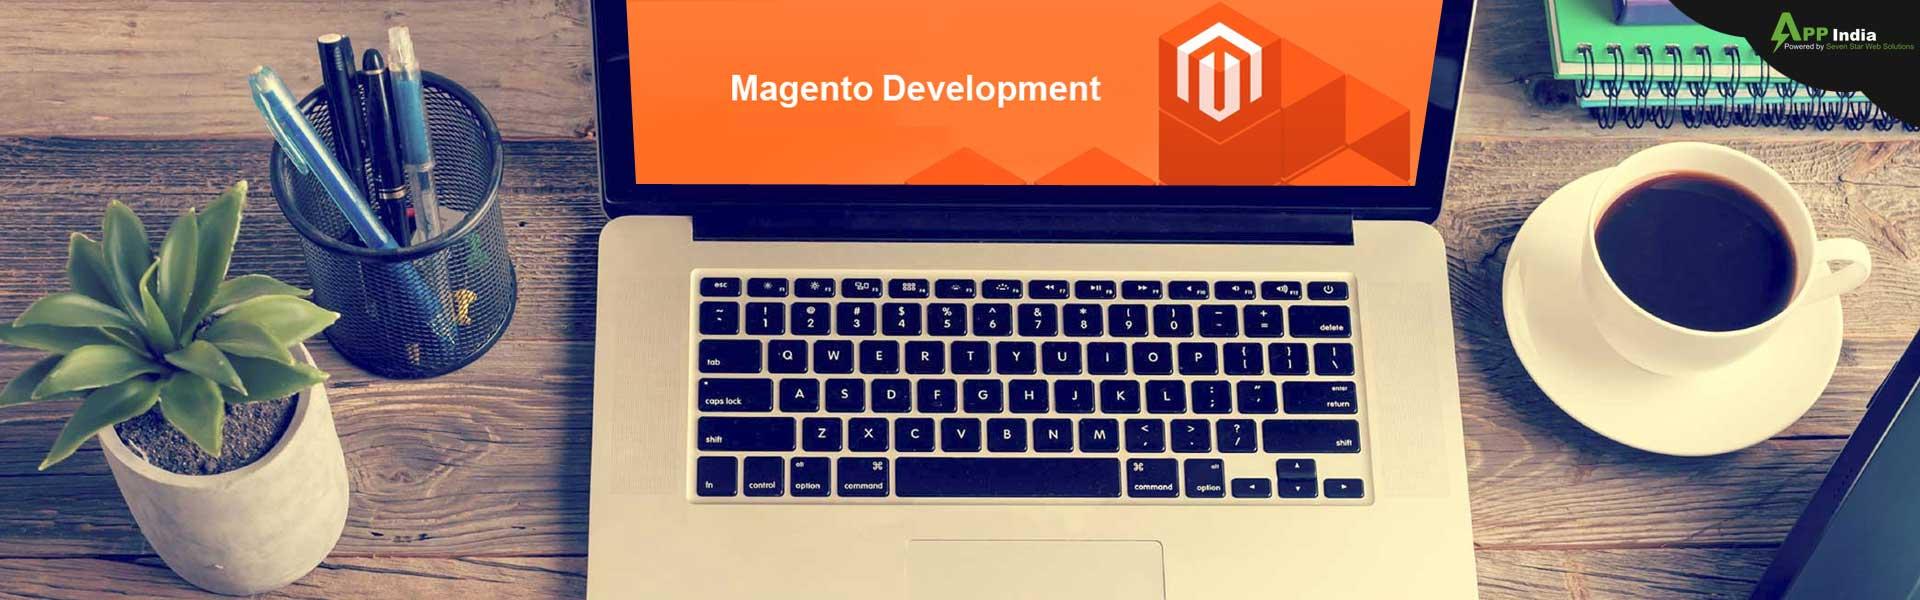 Magento Web Development Services